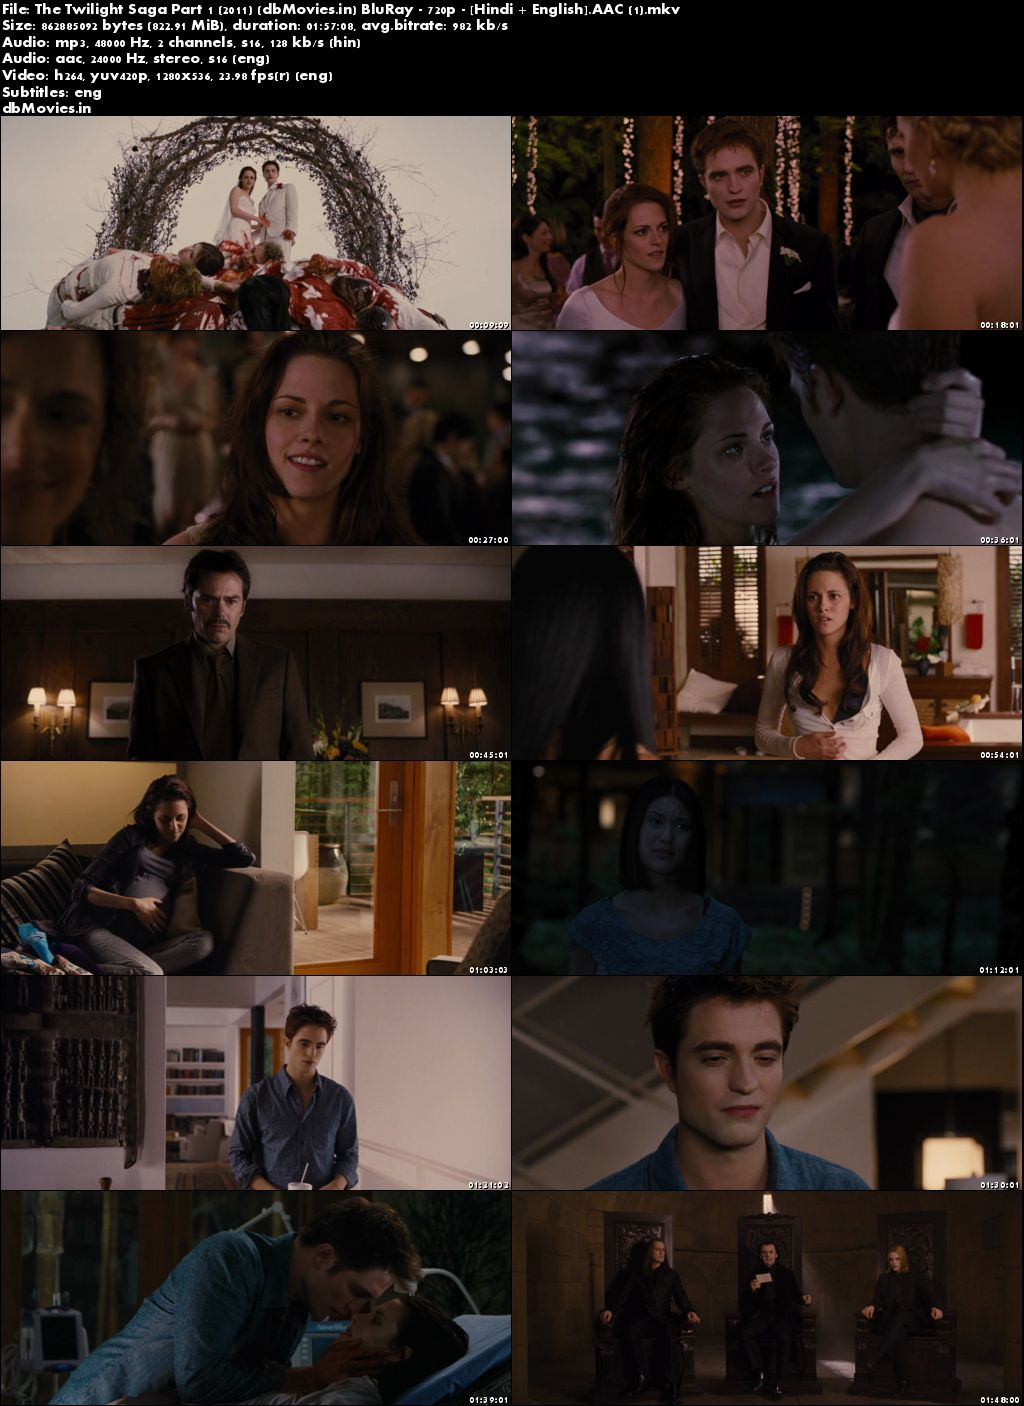 Screen Shots The Twilight Saga: Breaking Dawn - Part 1 2011 Dual Audio Hindi Download